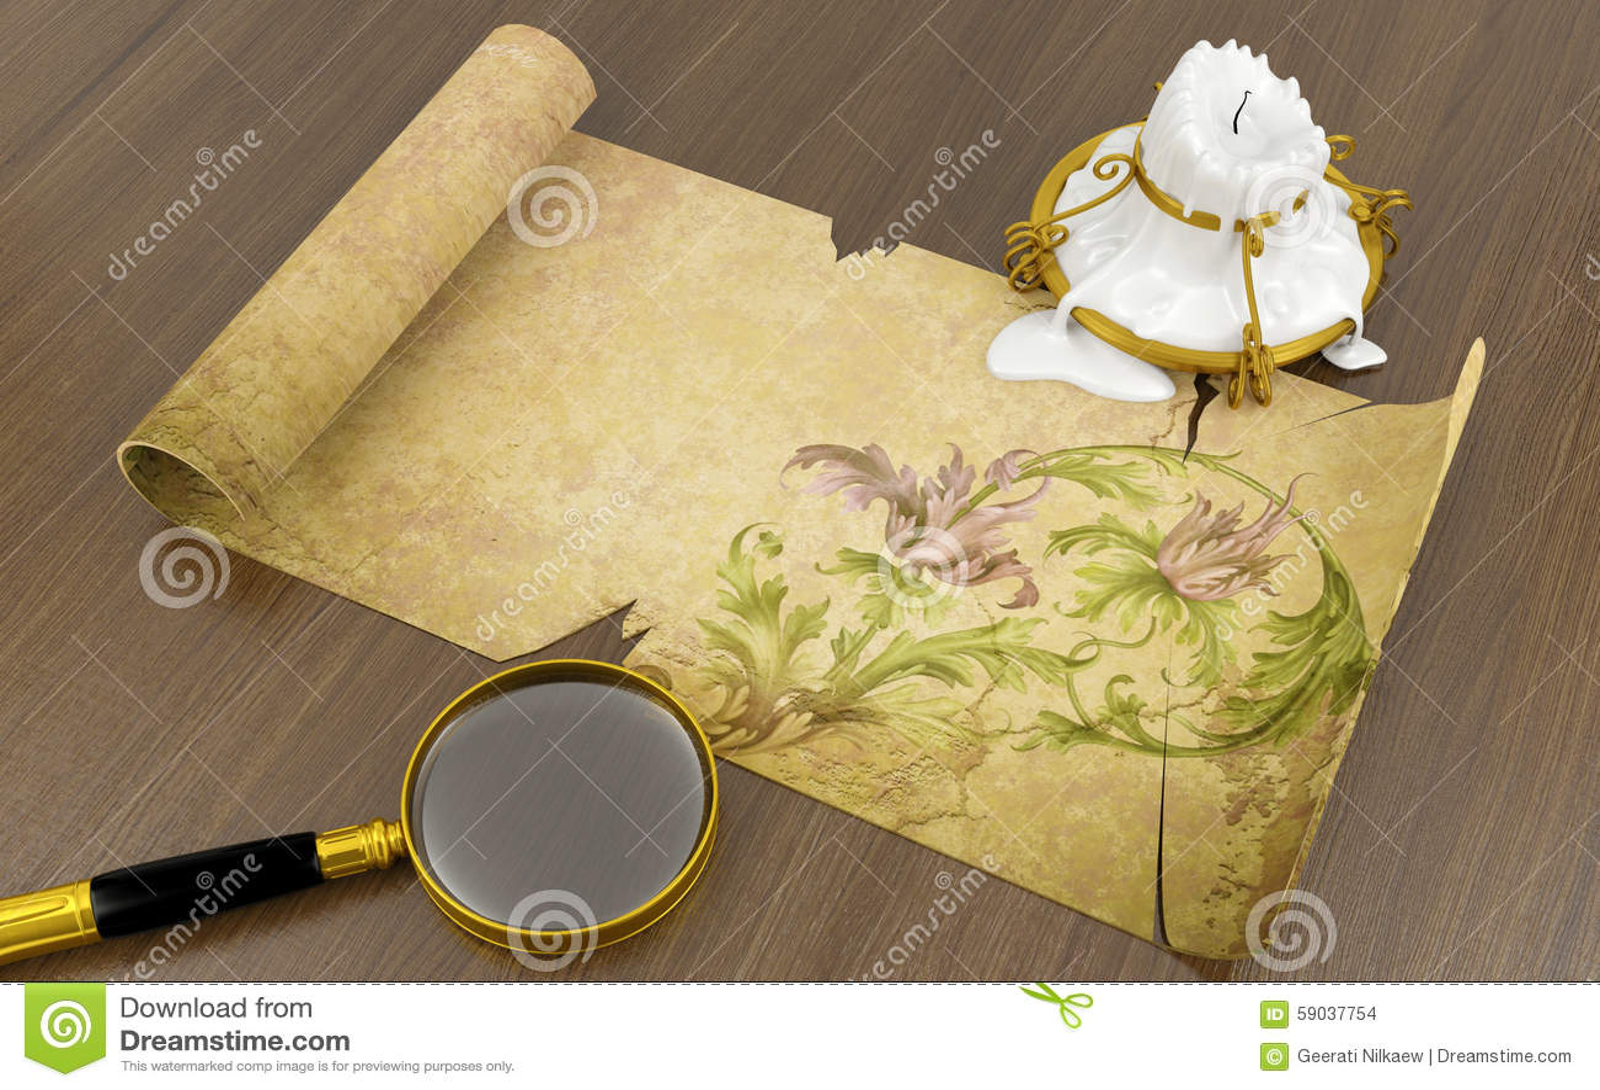 the old lie essay The old lie the nature of wwi history essay the old lie the nature of wwi history essay risparmia su wwi spedizione gratis (vedi condizioni) the old lie the nature.